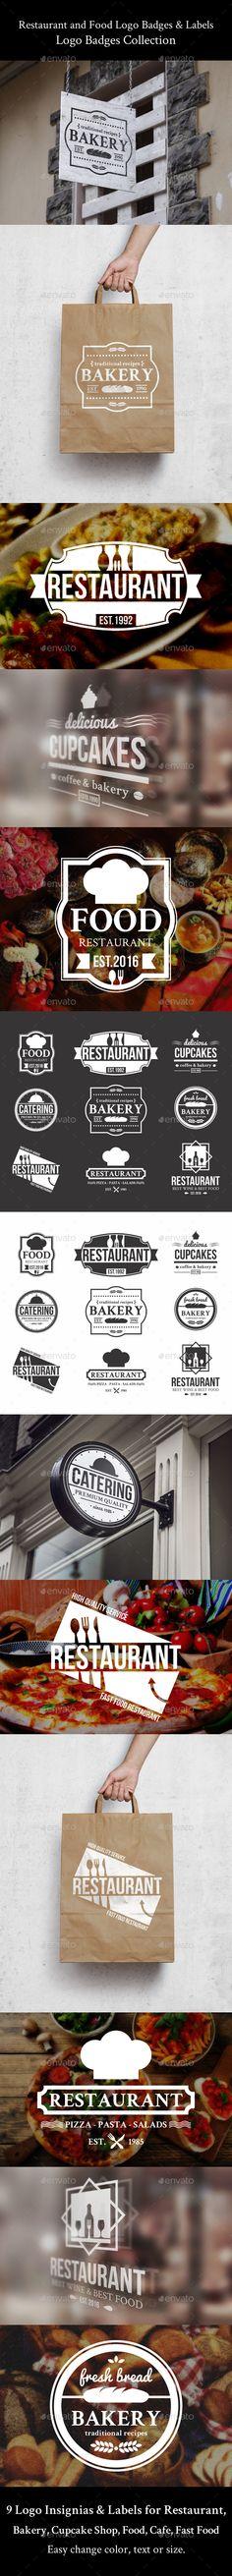 Restaurant and Food Logo Badges & Labels Template Vector EPS, AI Illustrator. Download here: https://graphicriver.net/item/restaurant-and-food-logo-badges-labels/17315254?ref=ksioks